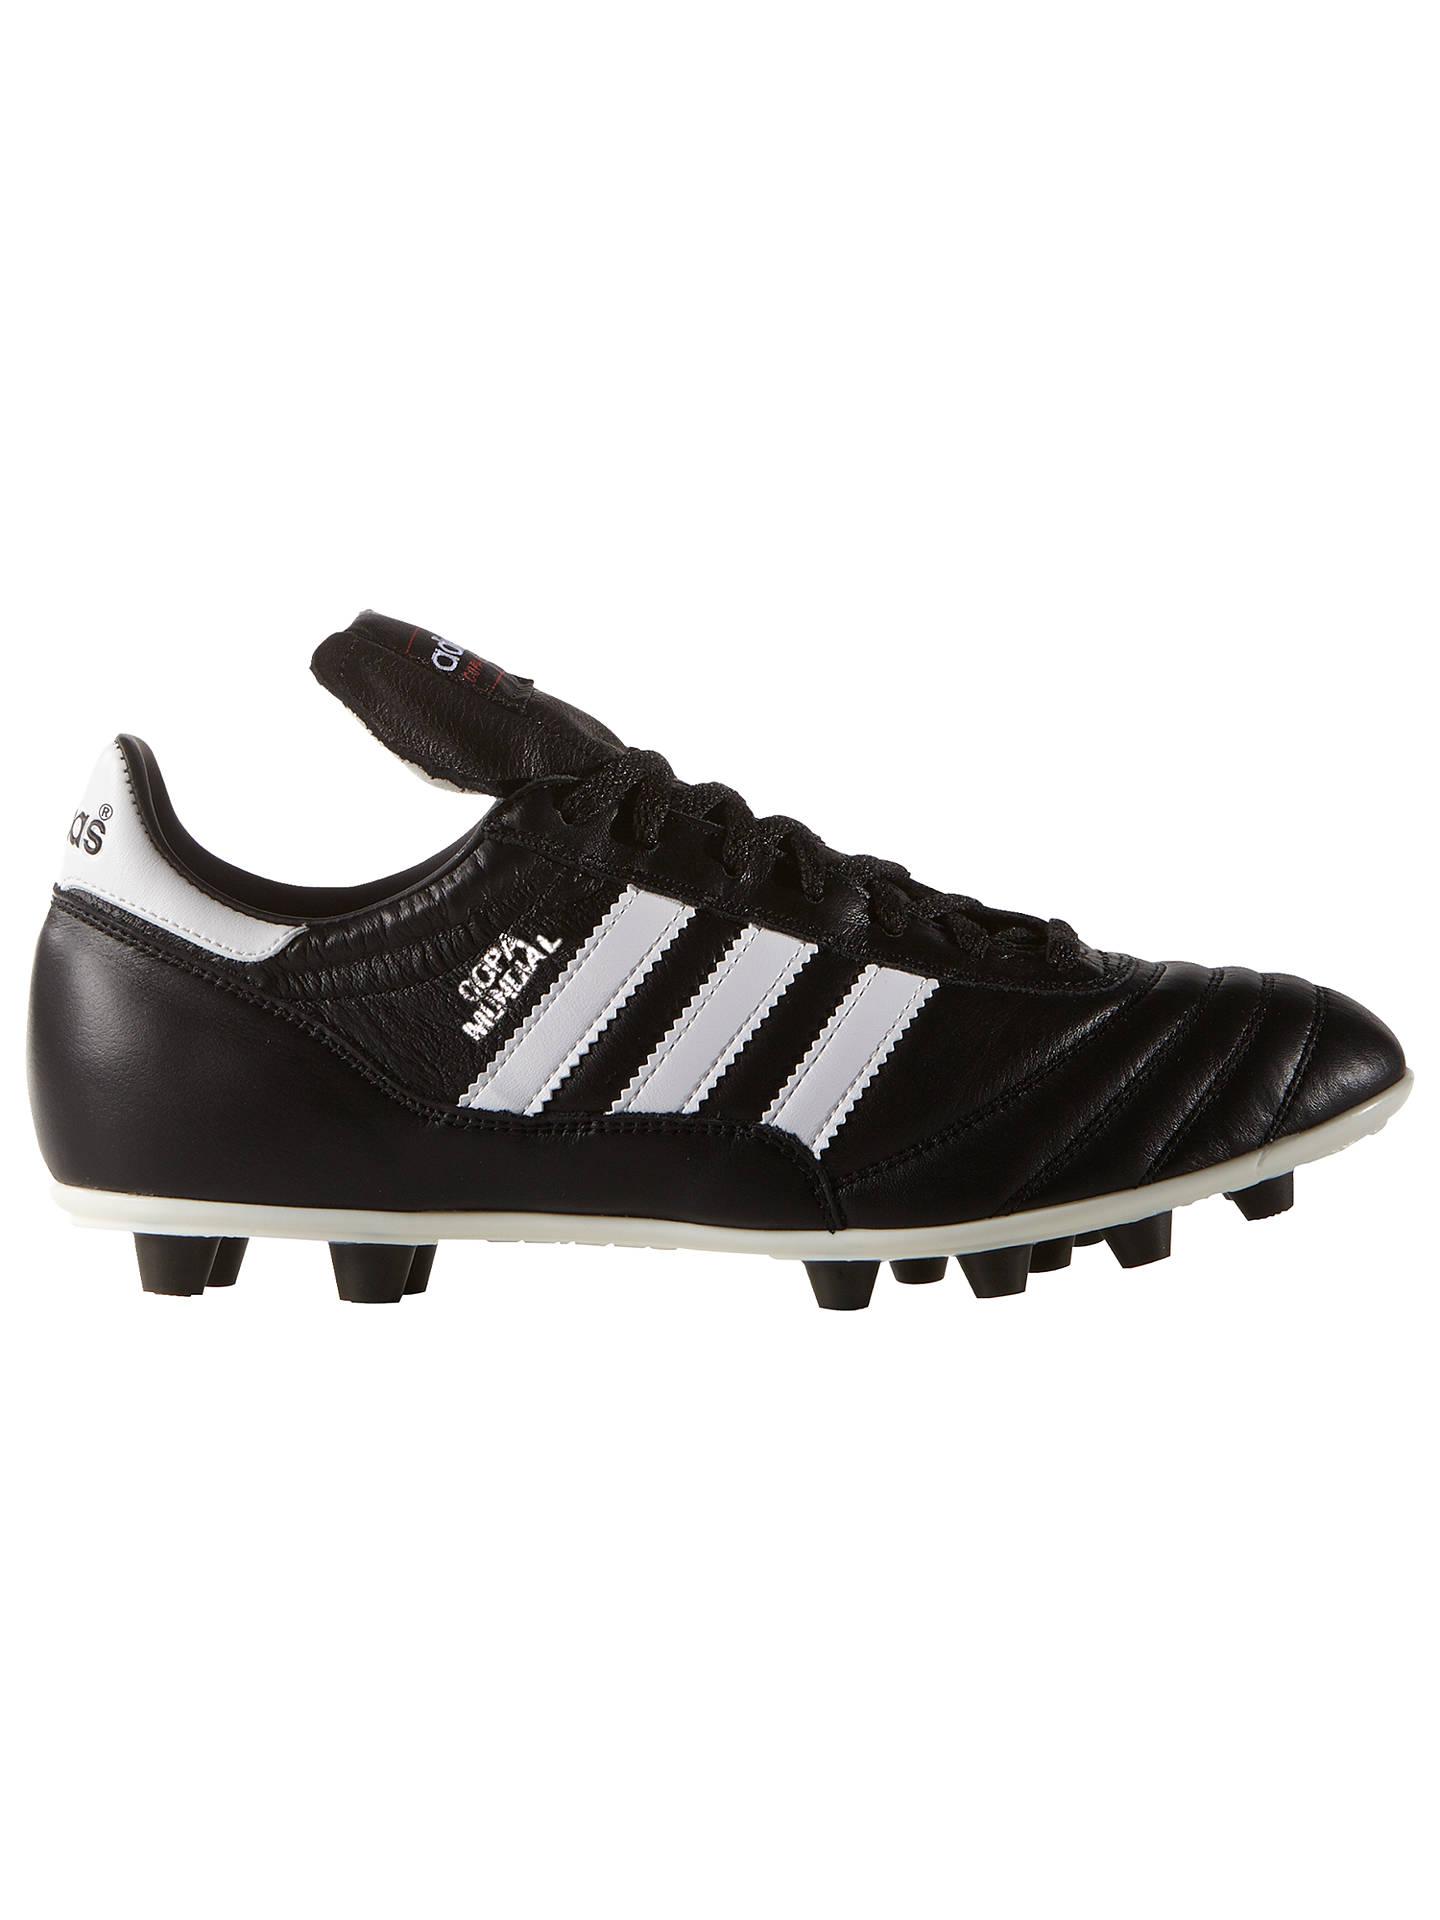 máscara Todo el mundo Disfraces  adidas Copa Mundial Samba Men's Football Boots, Black/White at John Lewis &  Partners